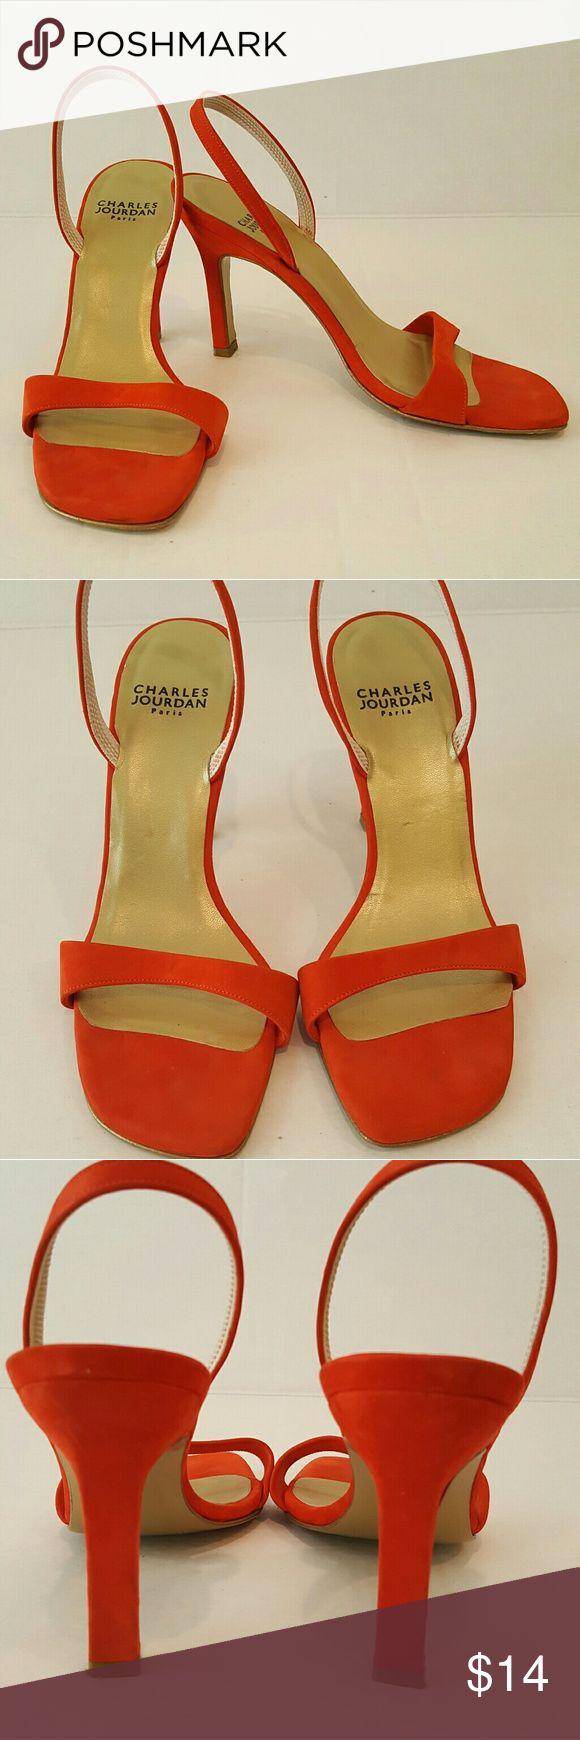 Charles Jourdan Paris Women's Slingback Side 6 Charles Jourdan Paris Women's Orange/Red  Slingback Side 6 Some marking on heel, please see pictures Charles Jourdan Shoes